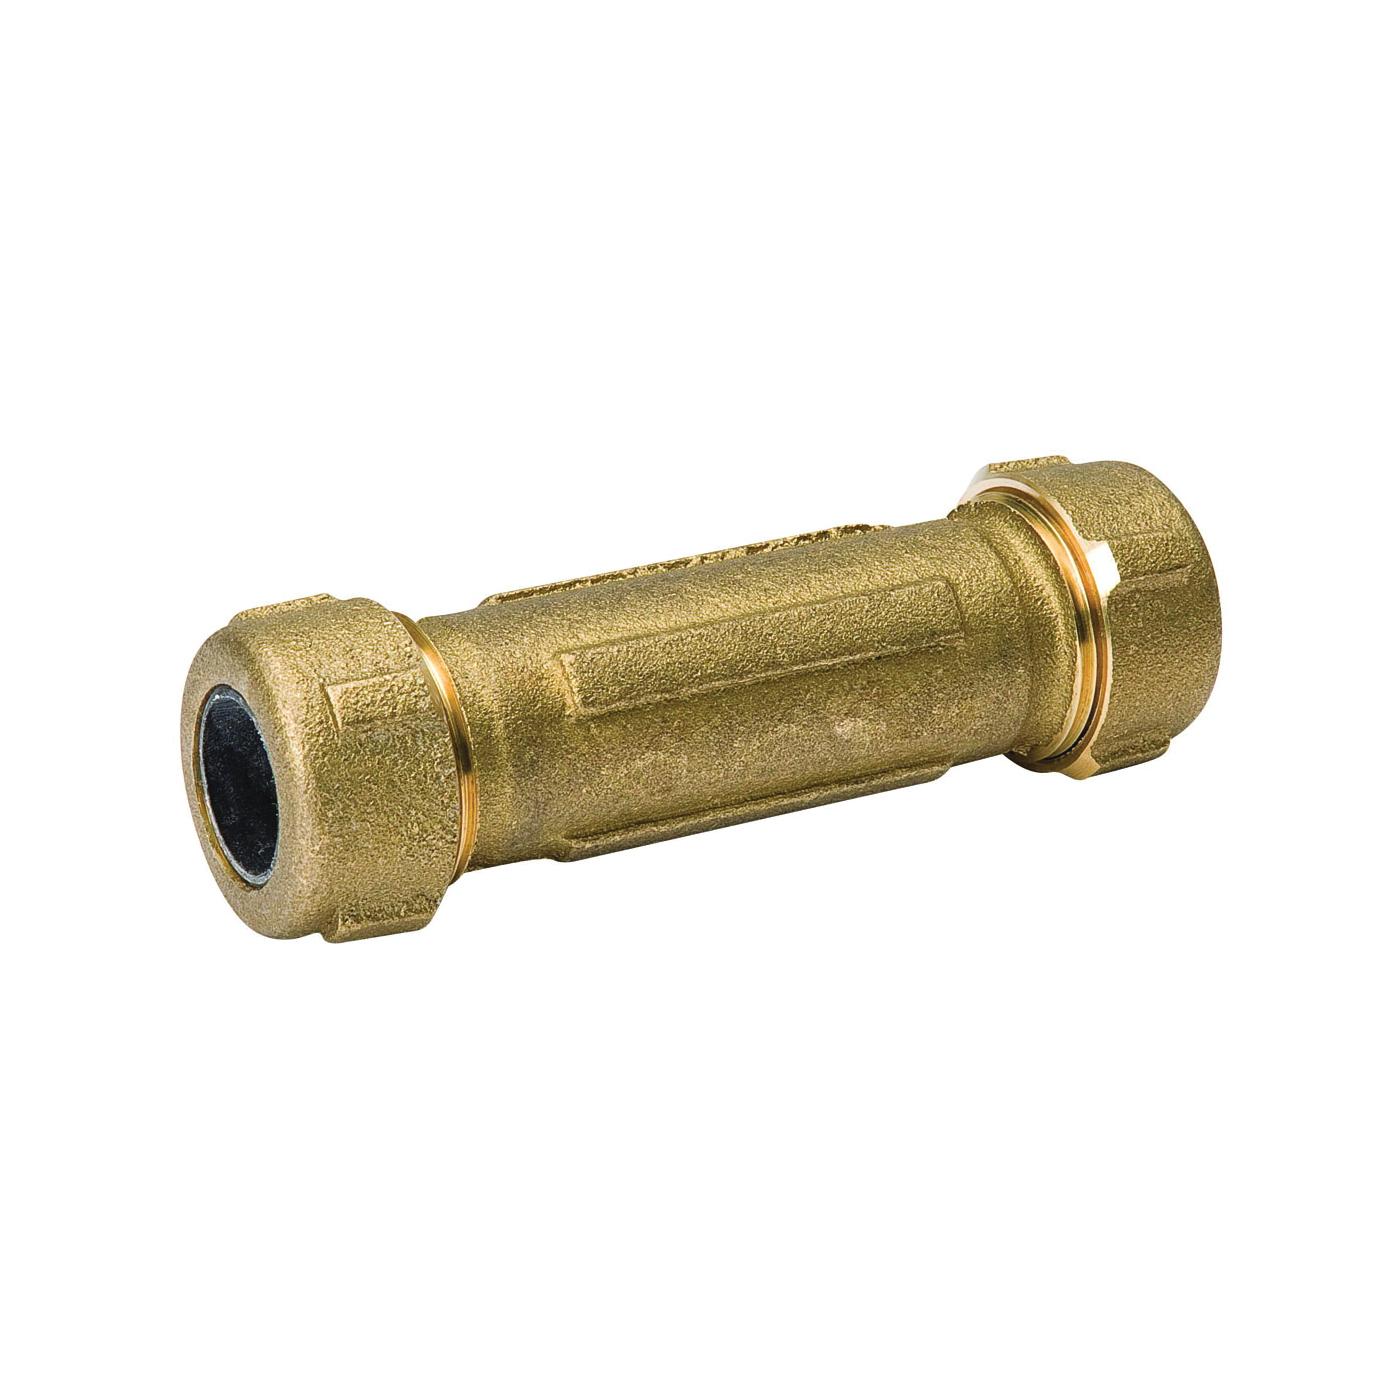 Picture of B & K 160-306NL Compression Coupler, 1-1/4 in, Brass, 125 psi Pressure